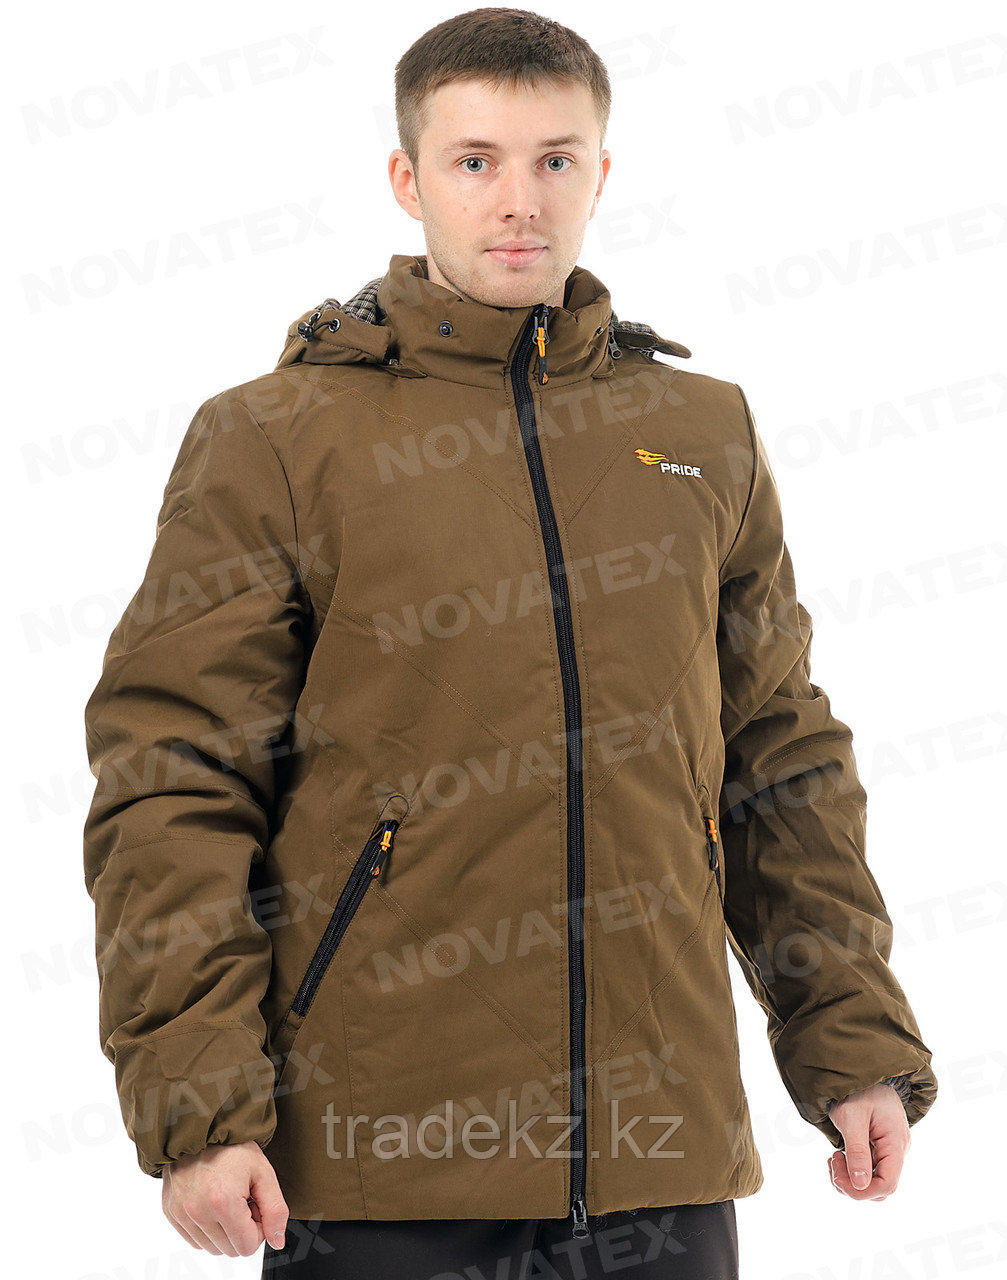 Куртка, парка зимняя Novatex Таганай (ткань граф, коричневый), размер 52-54